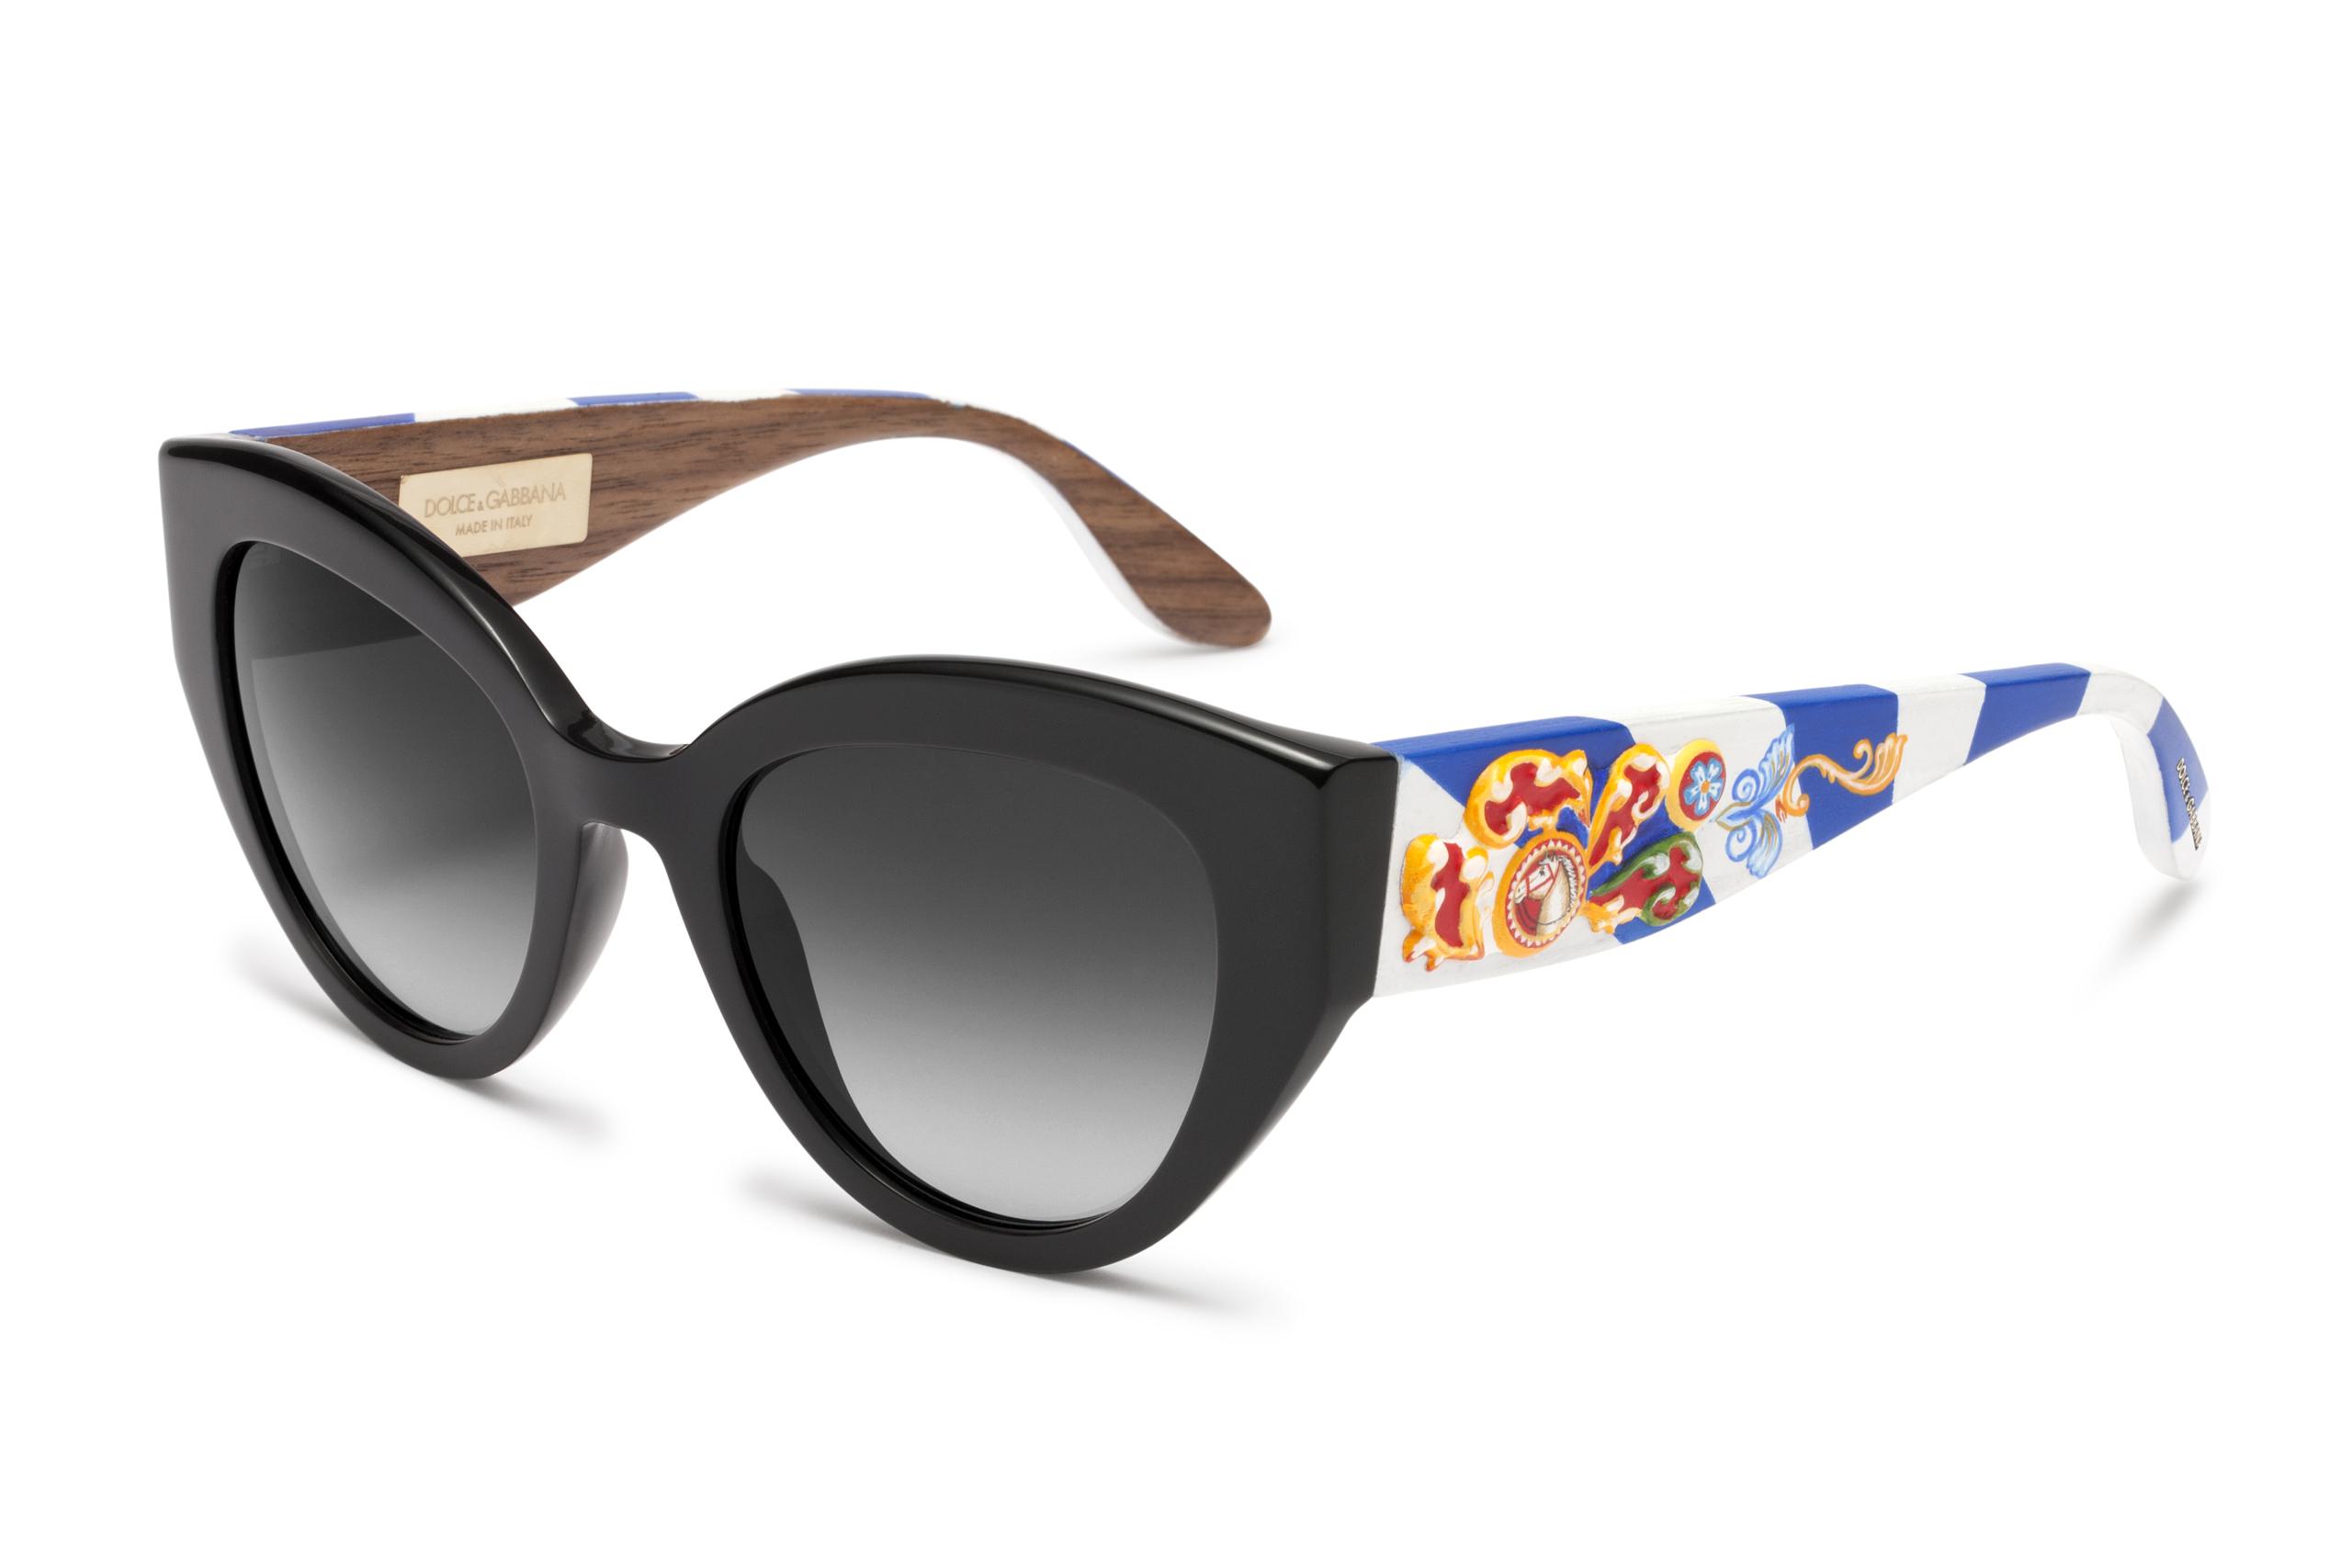 Foto de Gafas de sol Dolce Gabbana Sicilian Carretto (6/12)